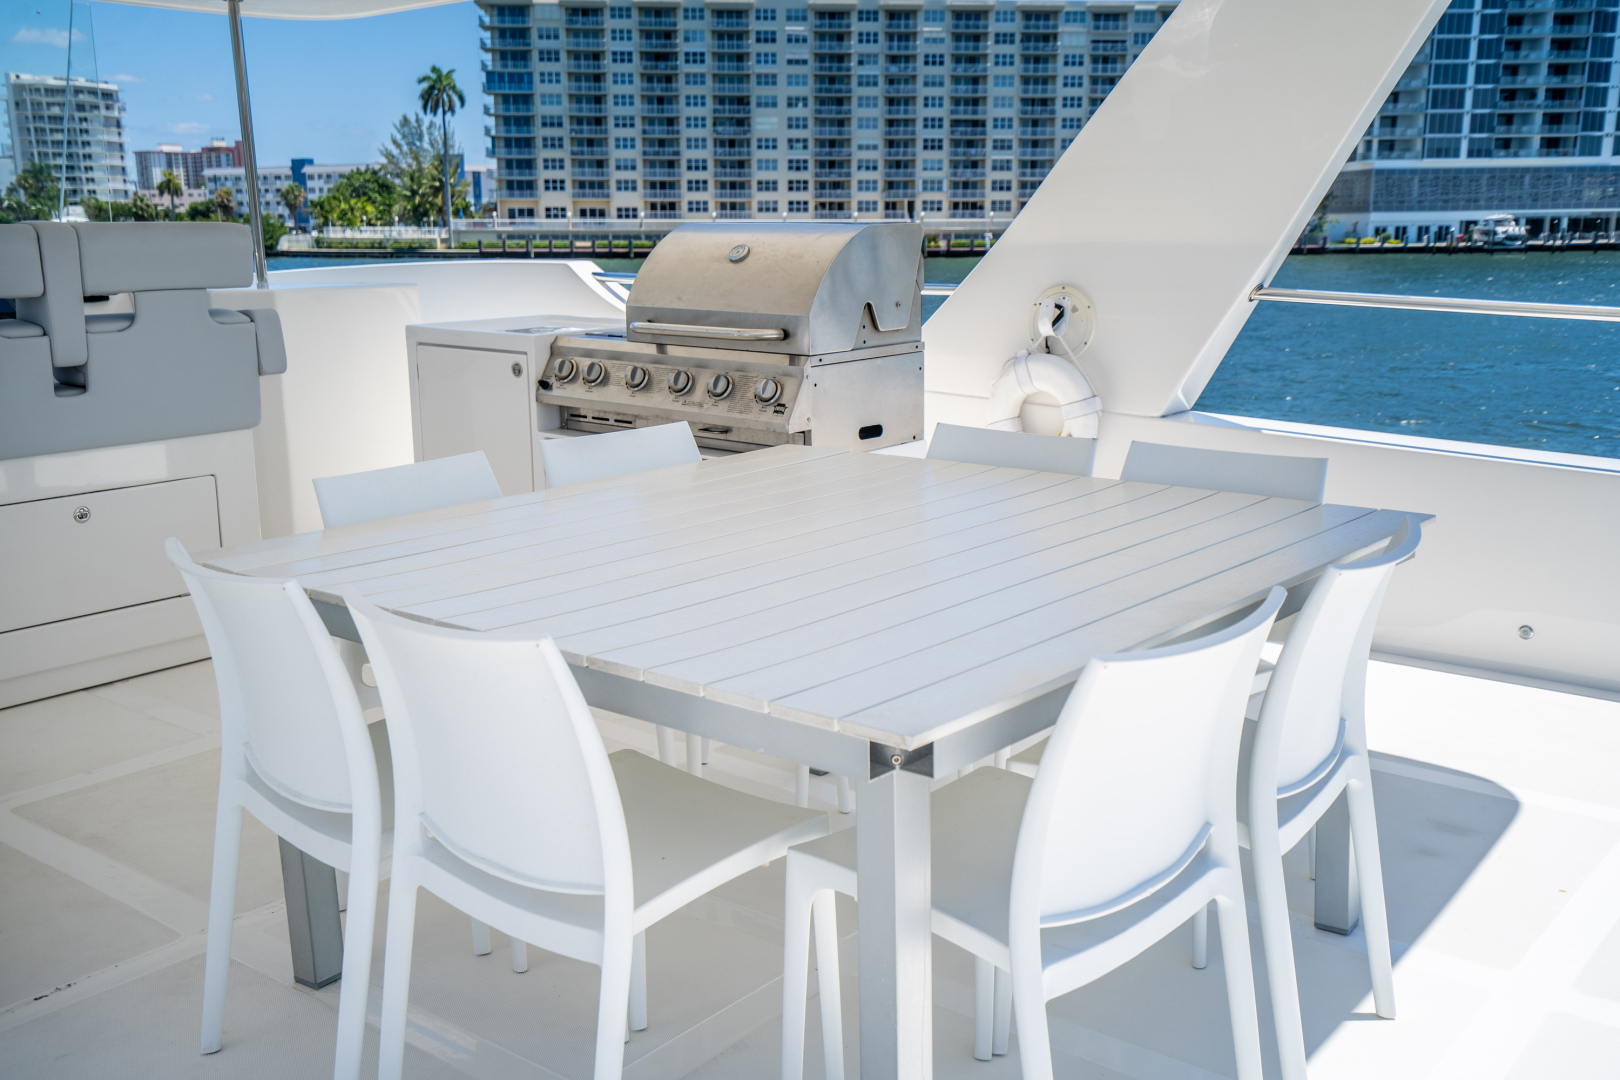 Overblue-58 Power Catamaran 2017-Techuila Ft. Lauderdale-Florida-United States-2017 Overblue 58 Powercat-1401250   Thumbnail